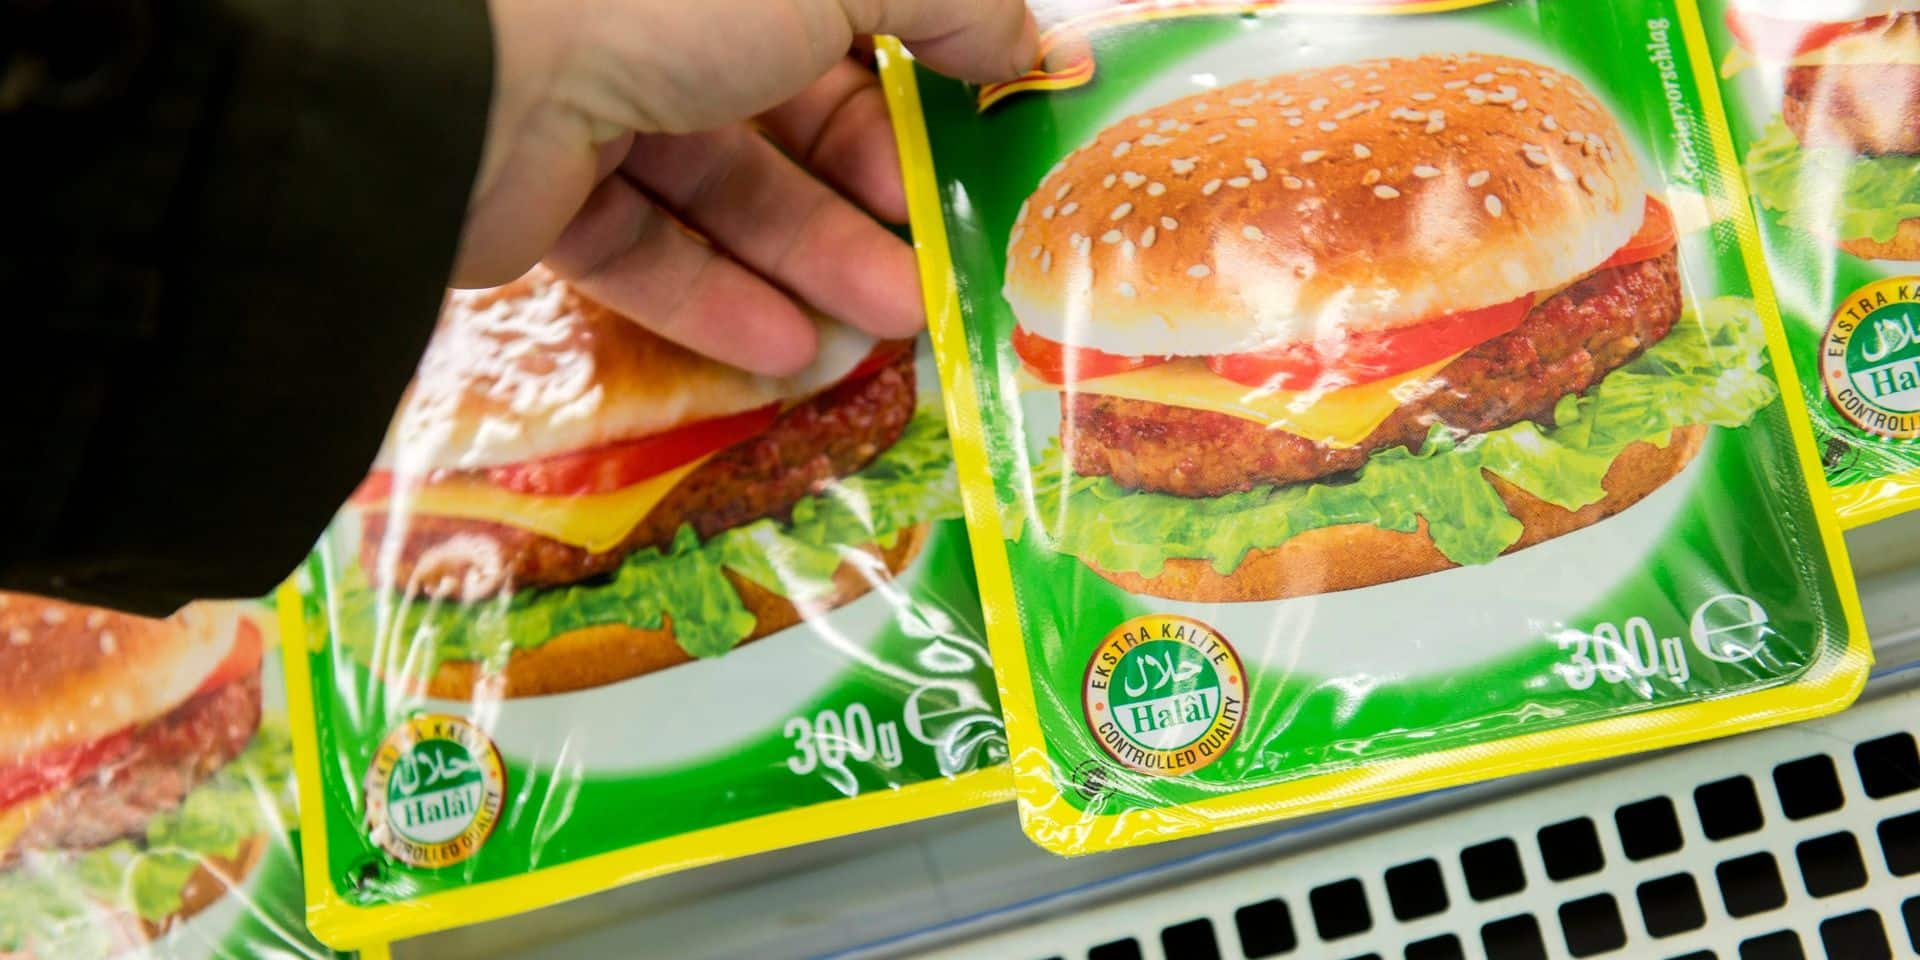 Colruyt s'intéresse au marché du halal